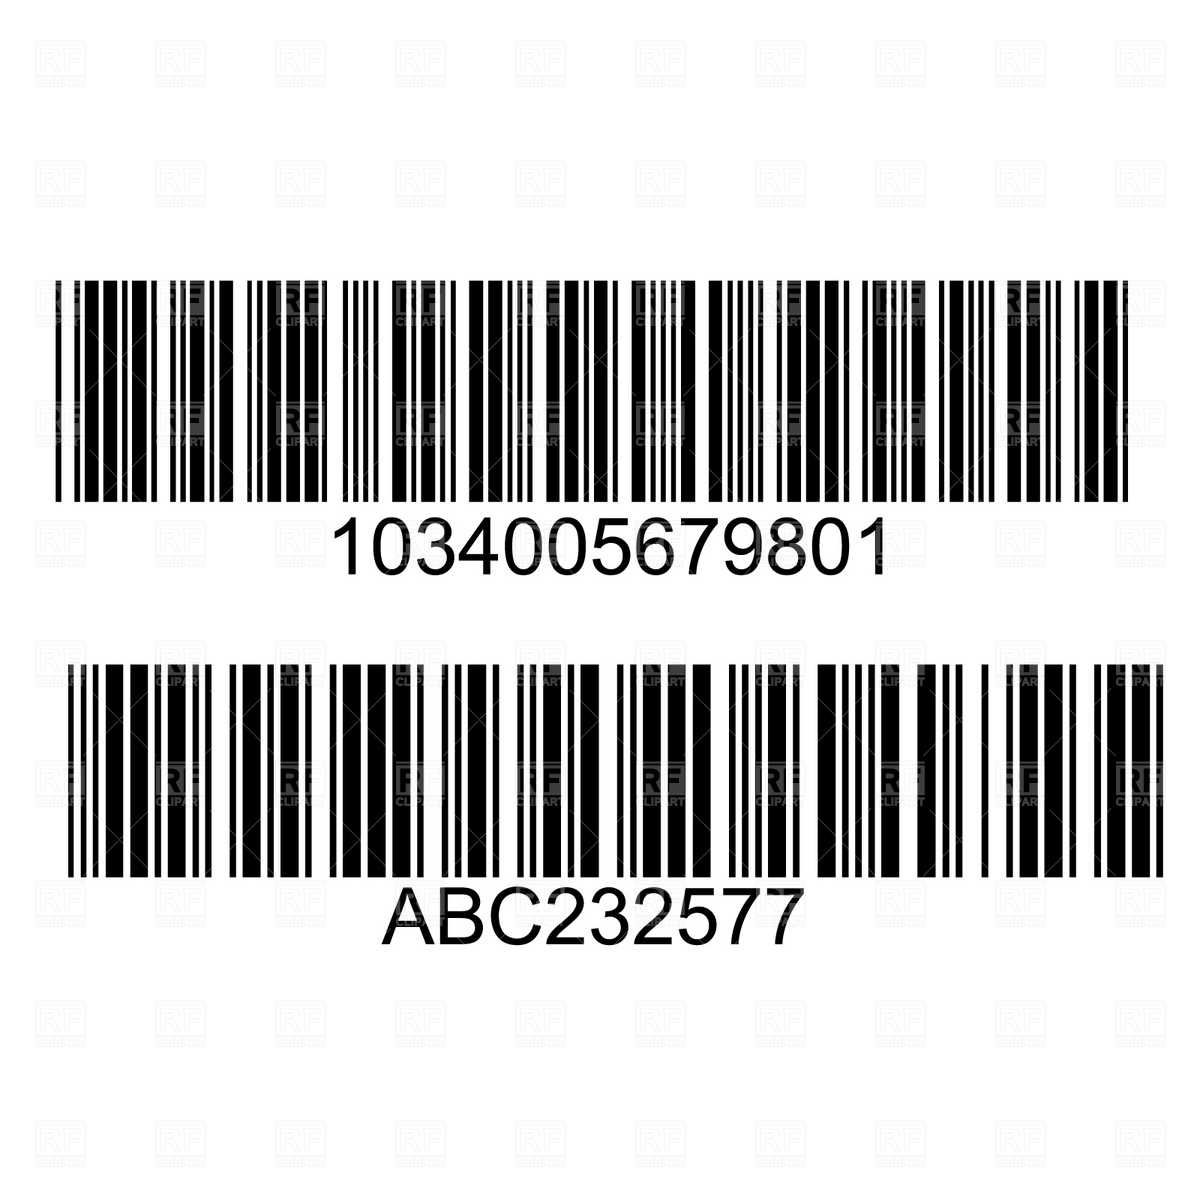 Barcode 1772 Signs Symbols Maps Download Royalty Free Vector Clip ...